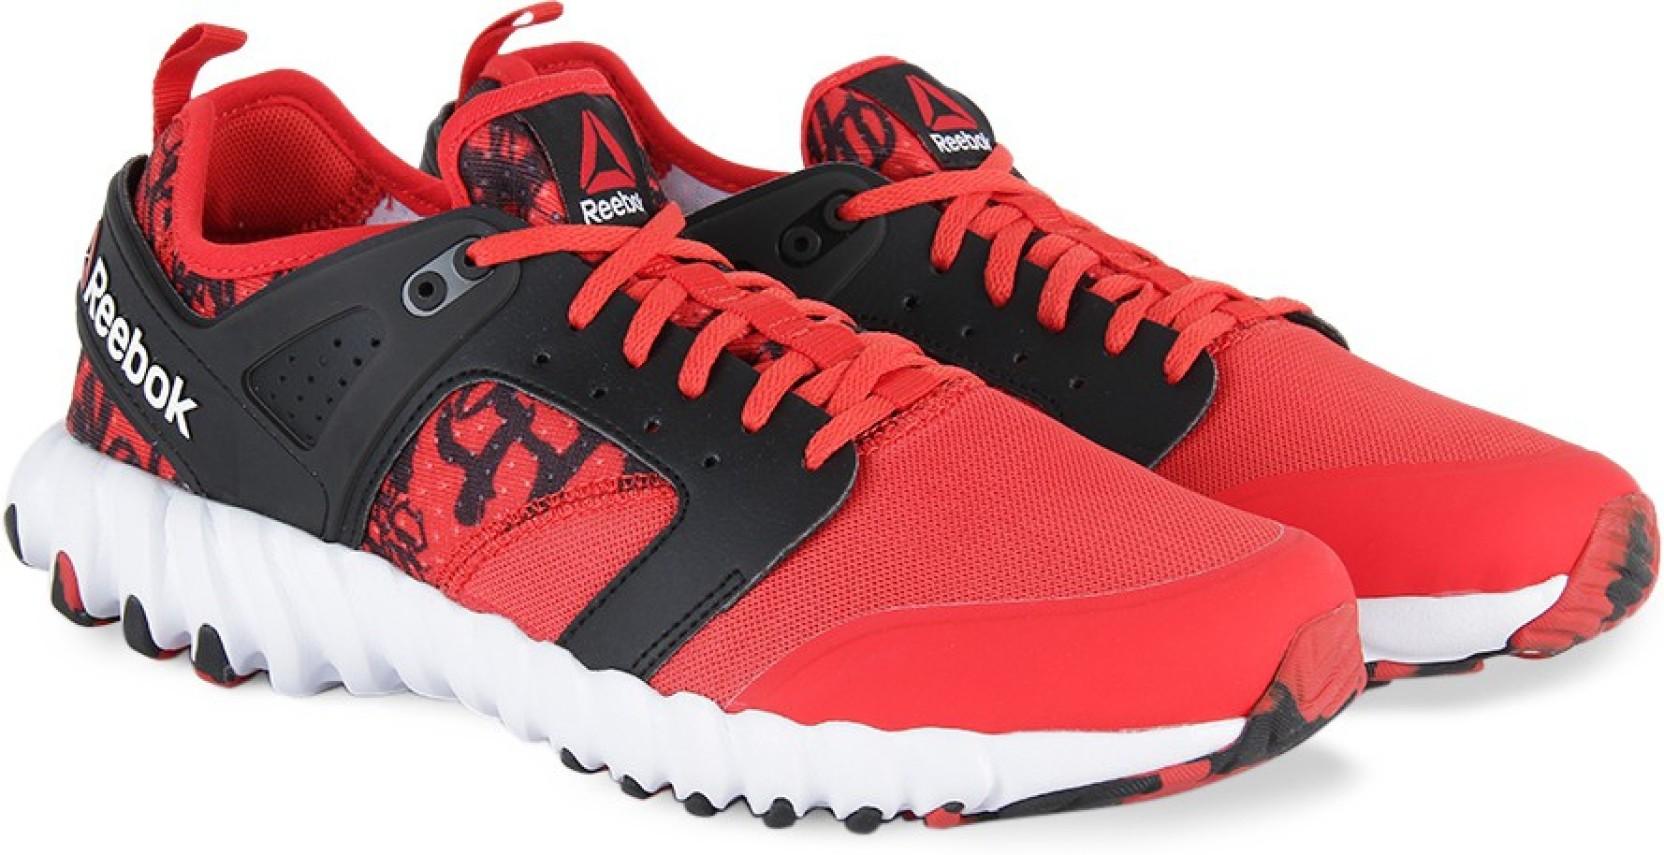 REEBOK TWISTFORM 2.0 GR Men Running Shoes For Men - Buy RED BLACK ... 6b50eed68